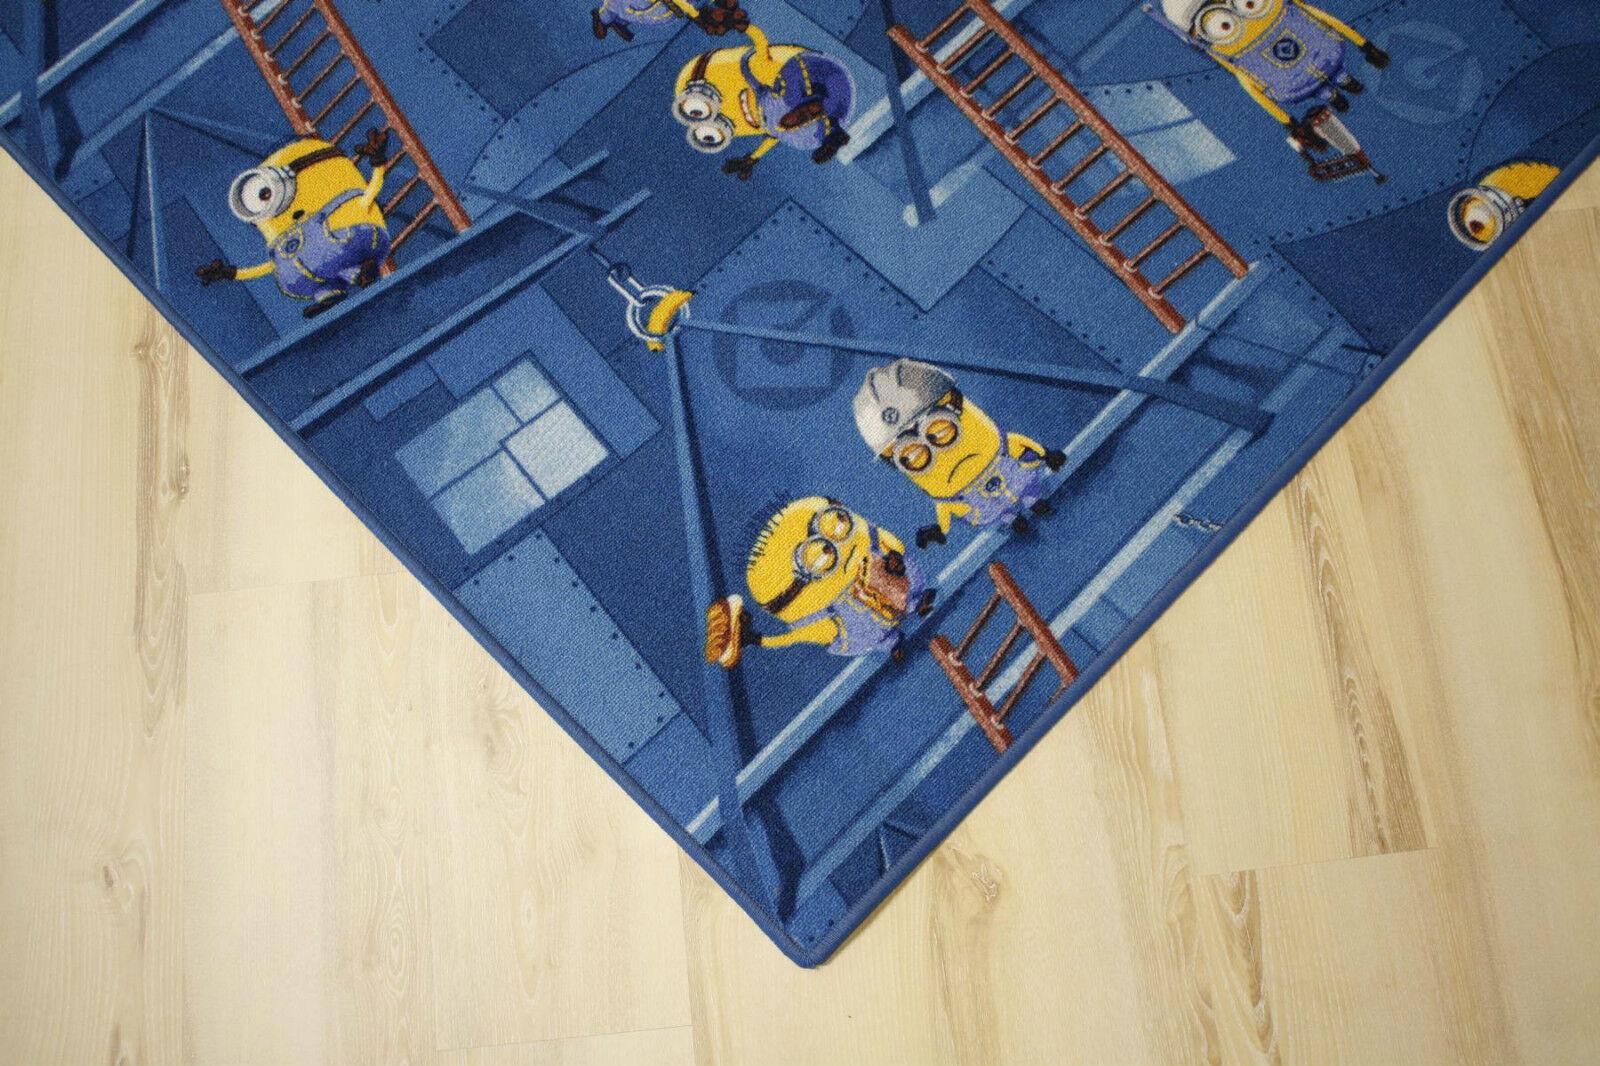 Enfants Tapis Tapis de jeu sbires bleu 200x430 cm NEUF